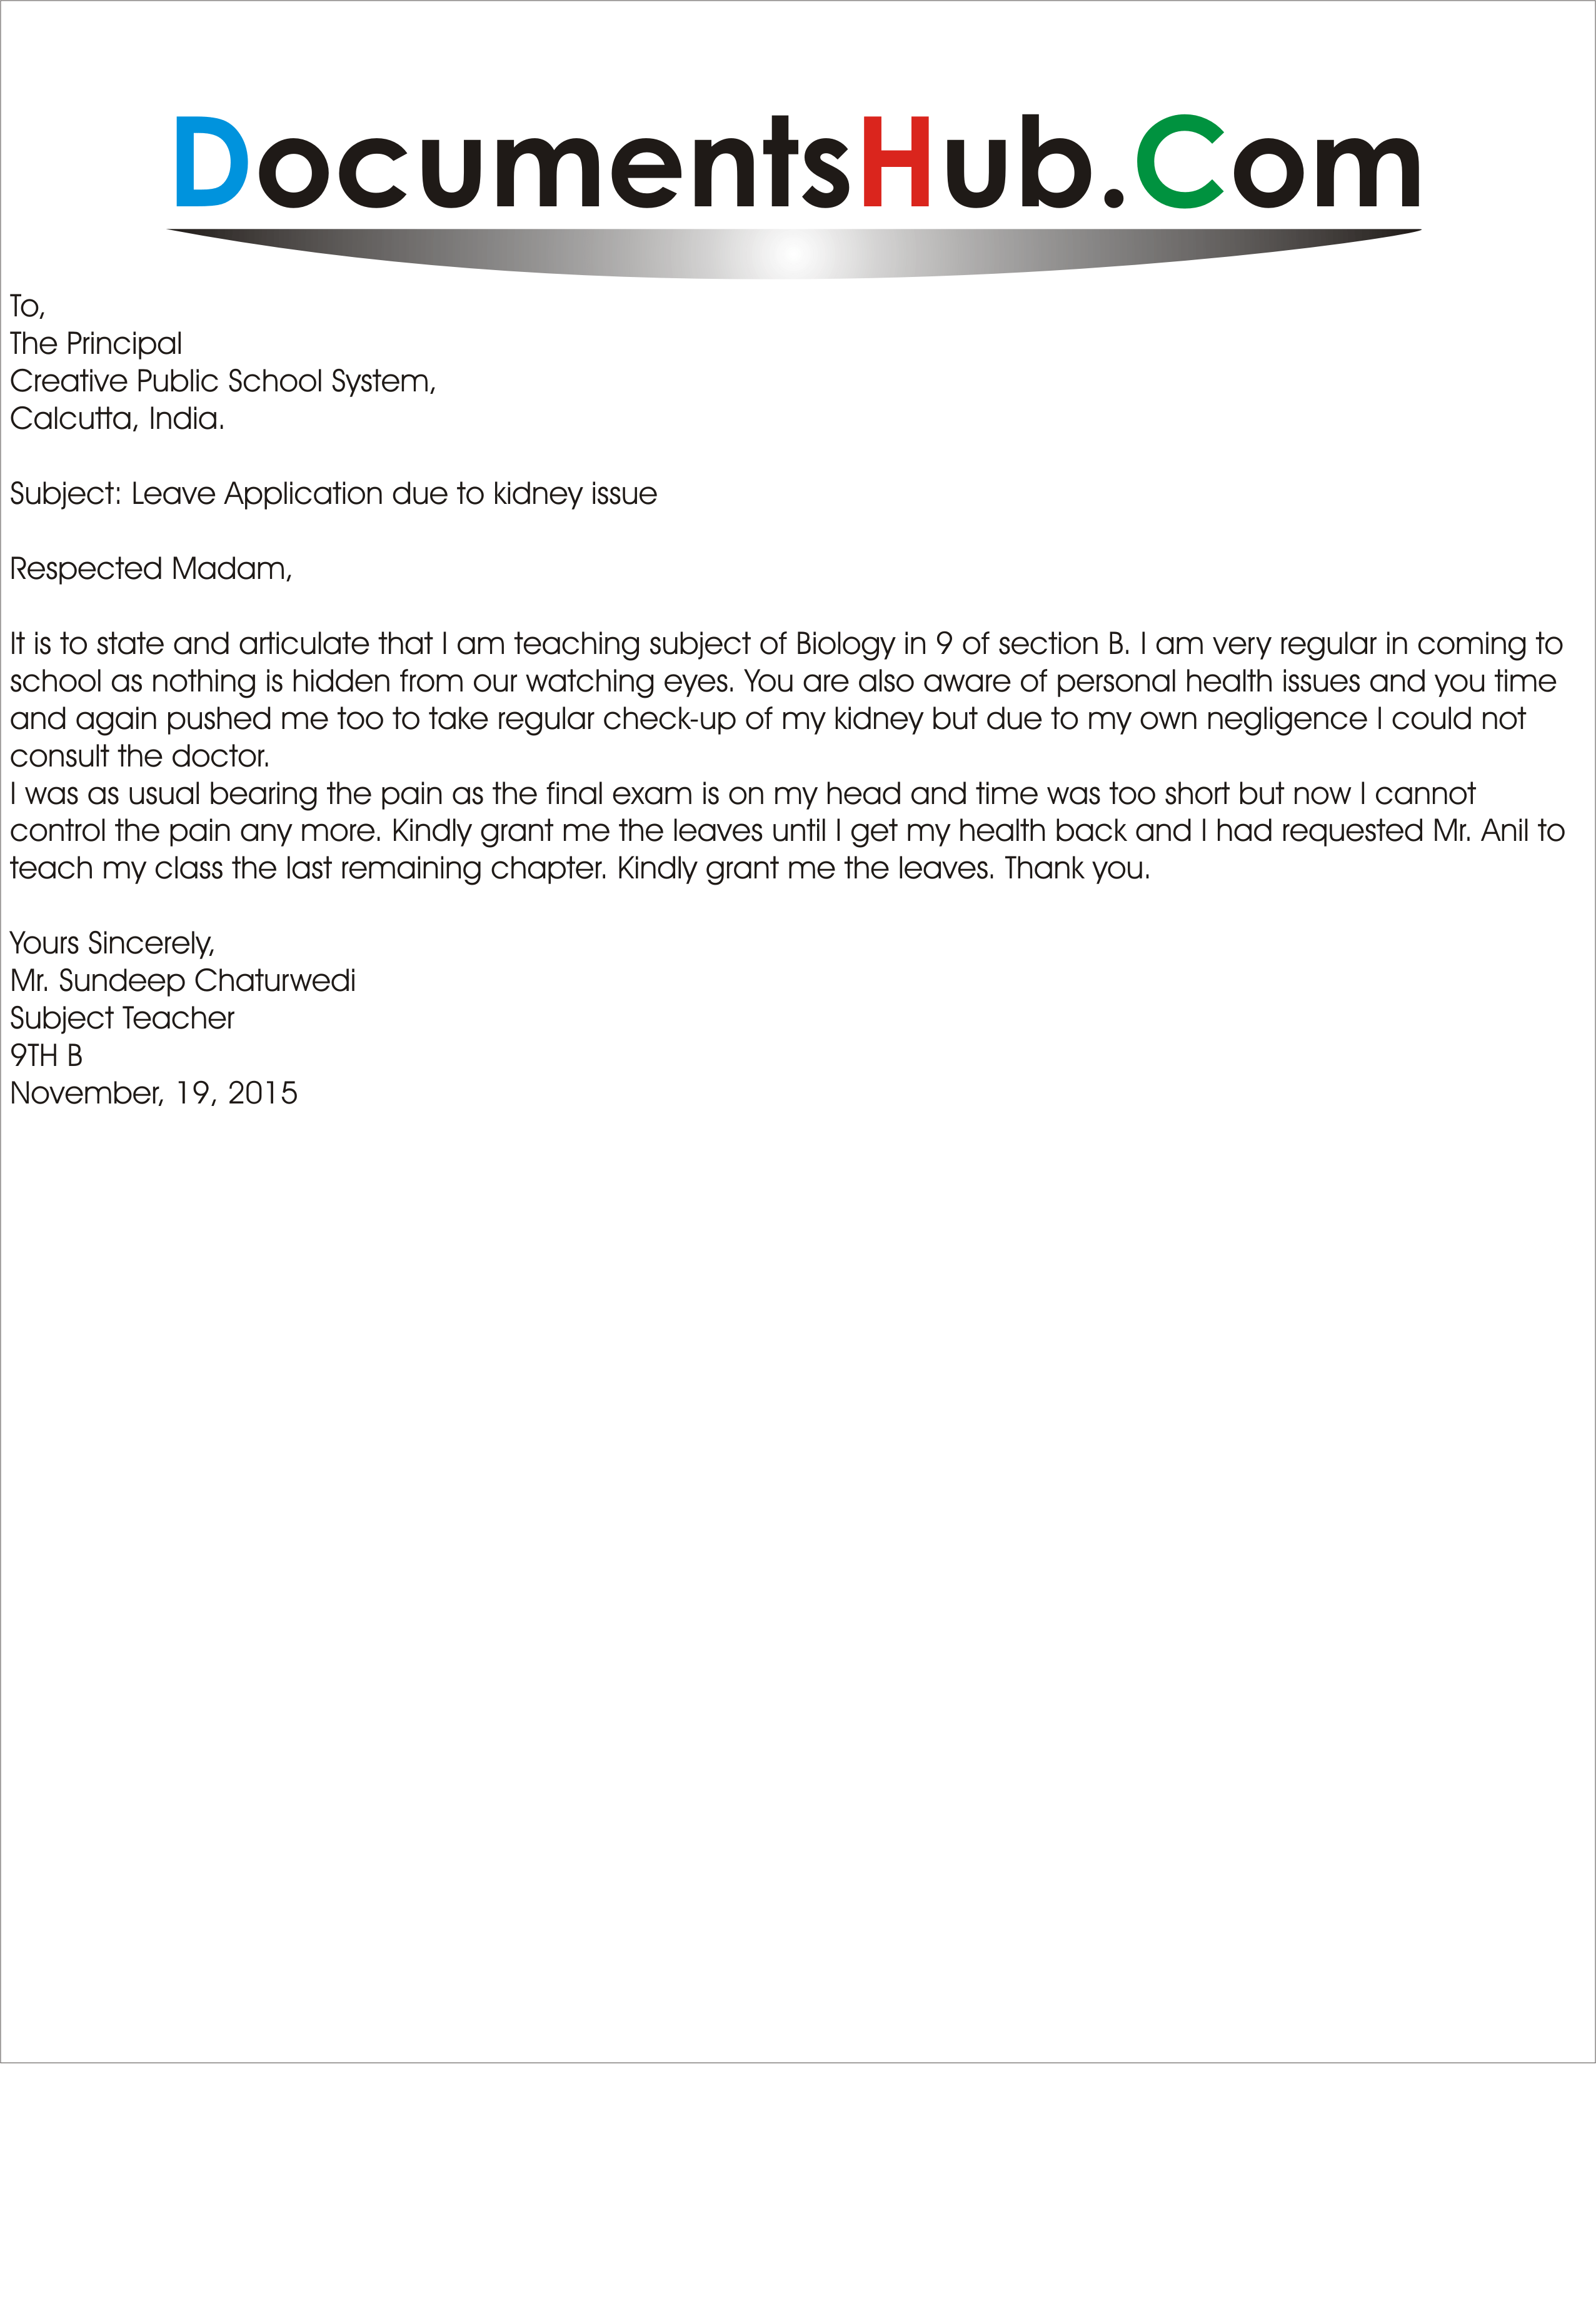 sick leave application sample for achool